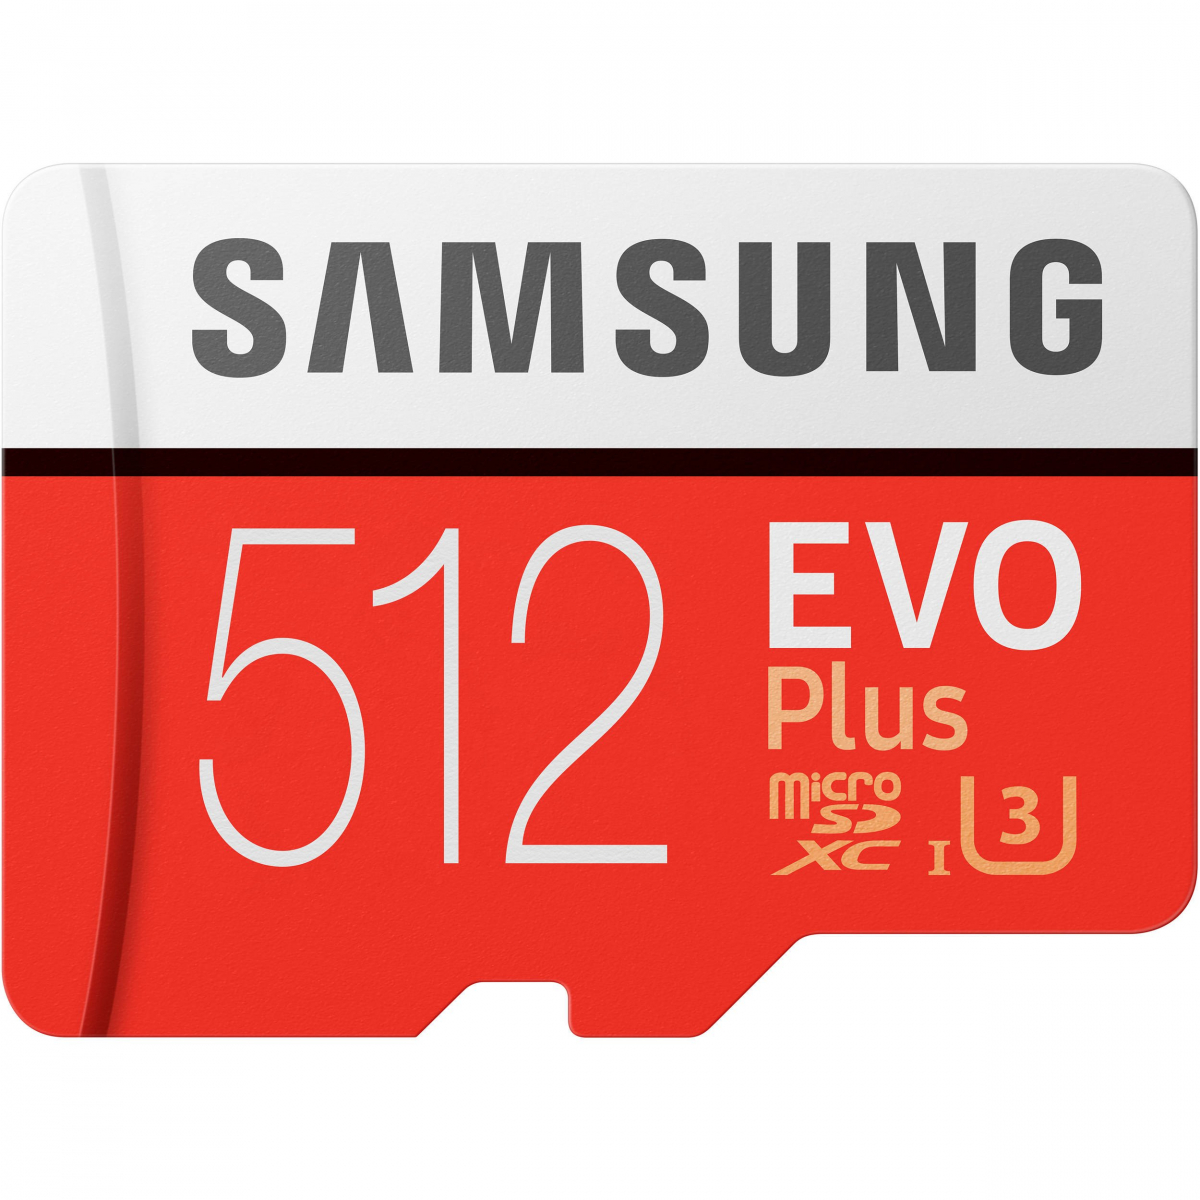 SAMSUNG MICRO SD 512GB EVO PLUS